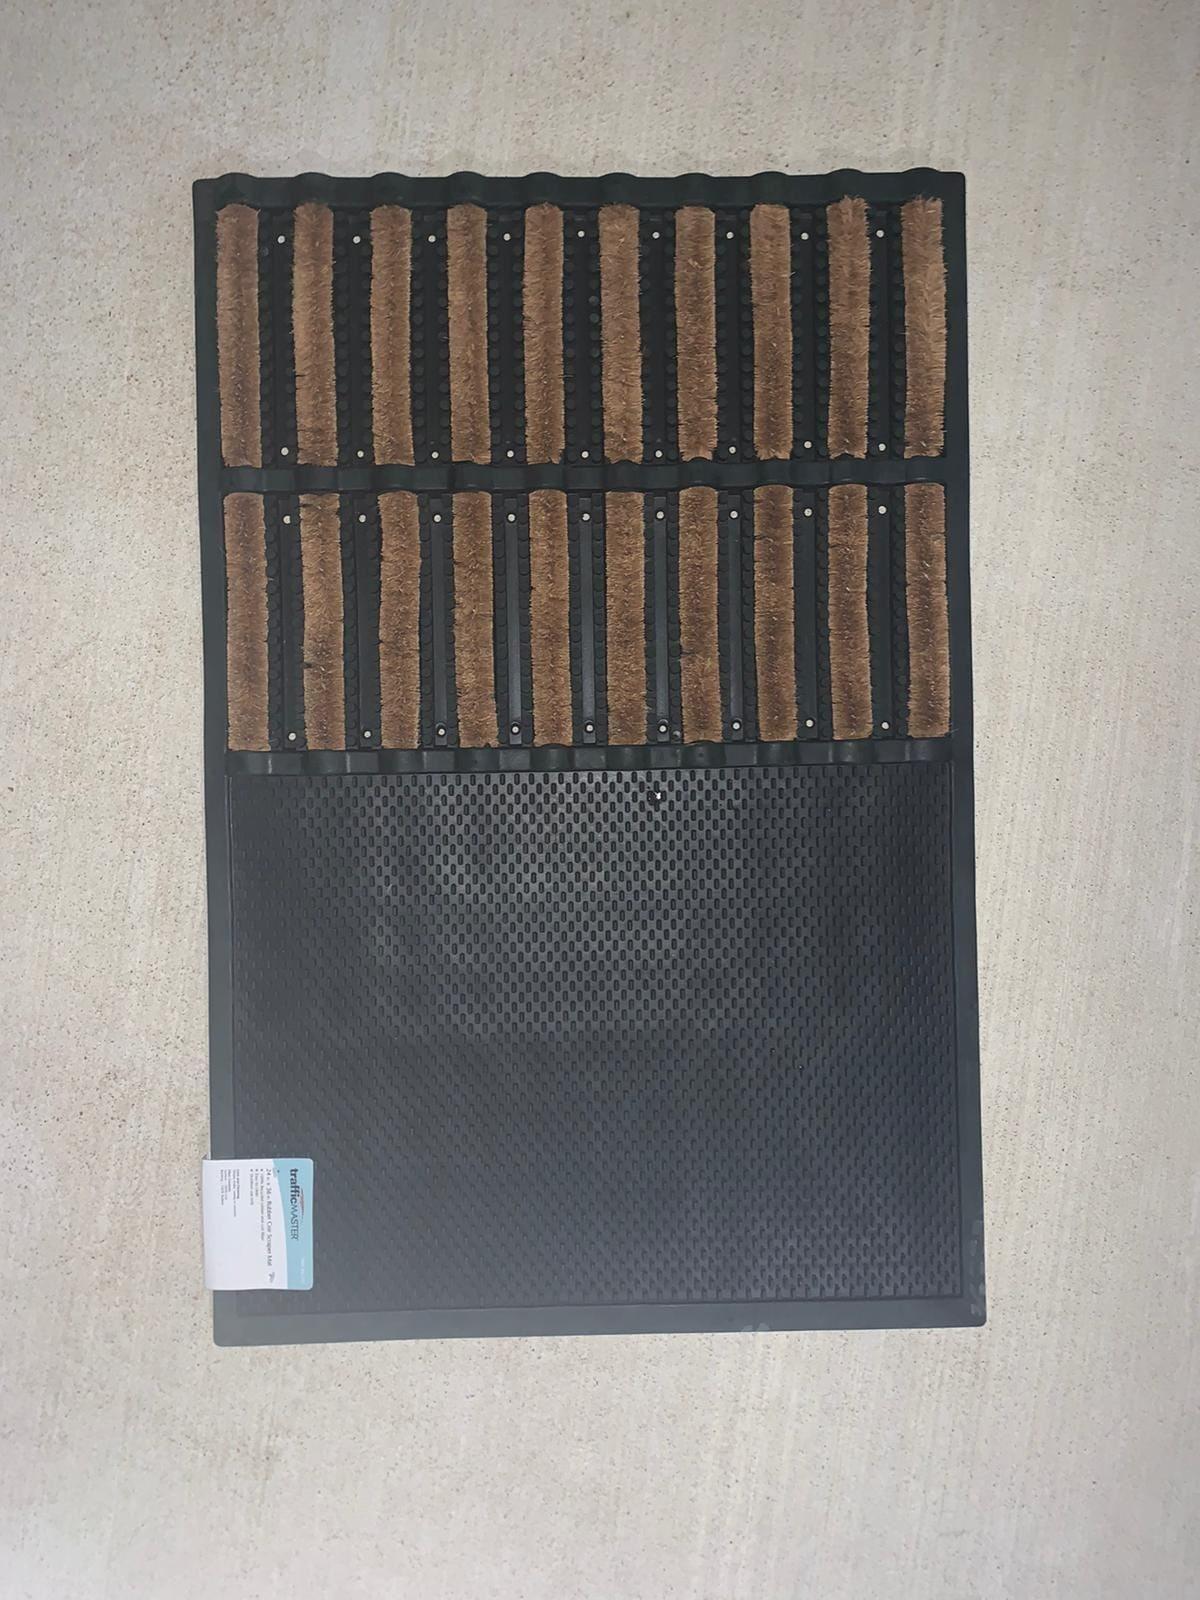 New Sanitizing Disinfect Shoe Mat